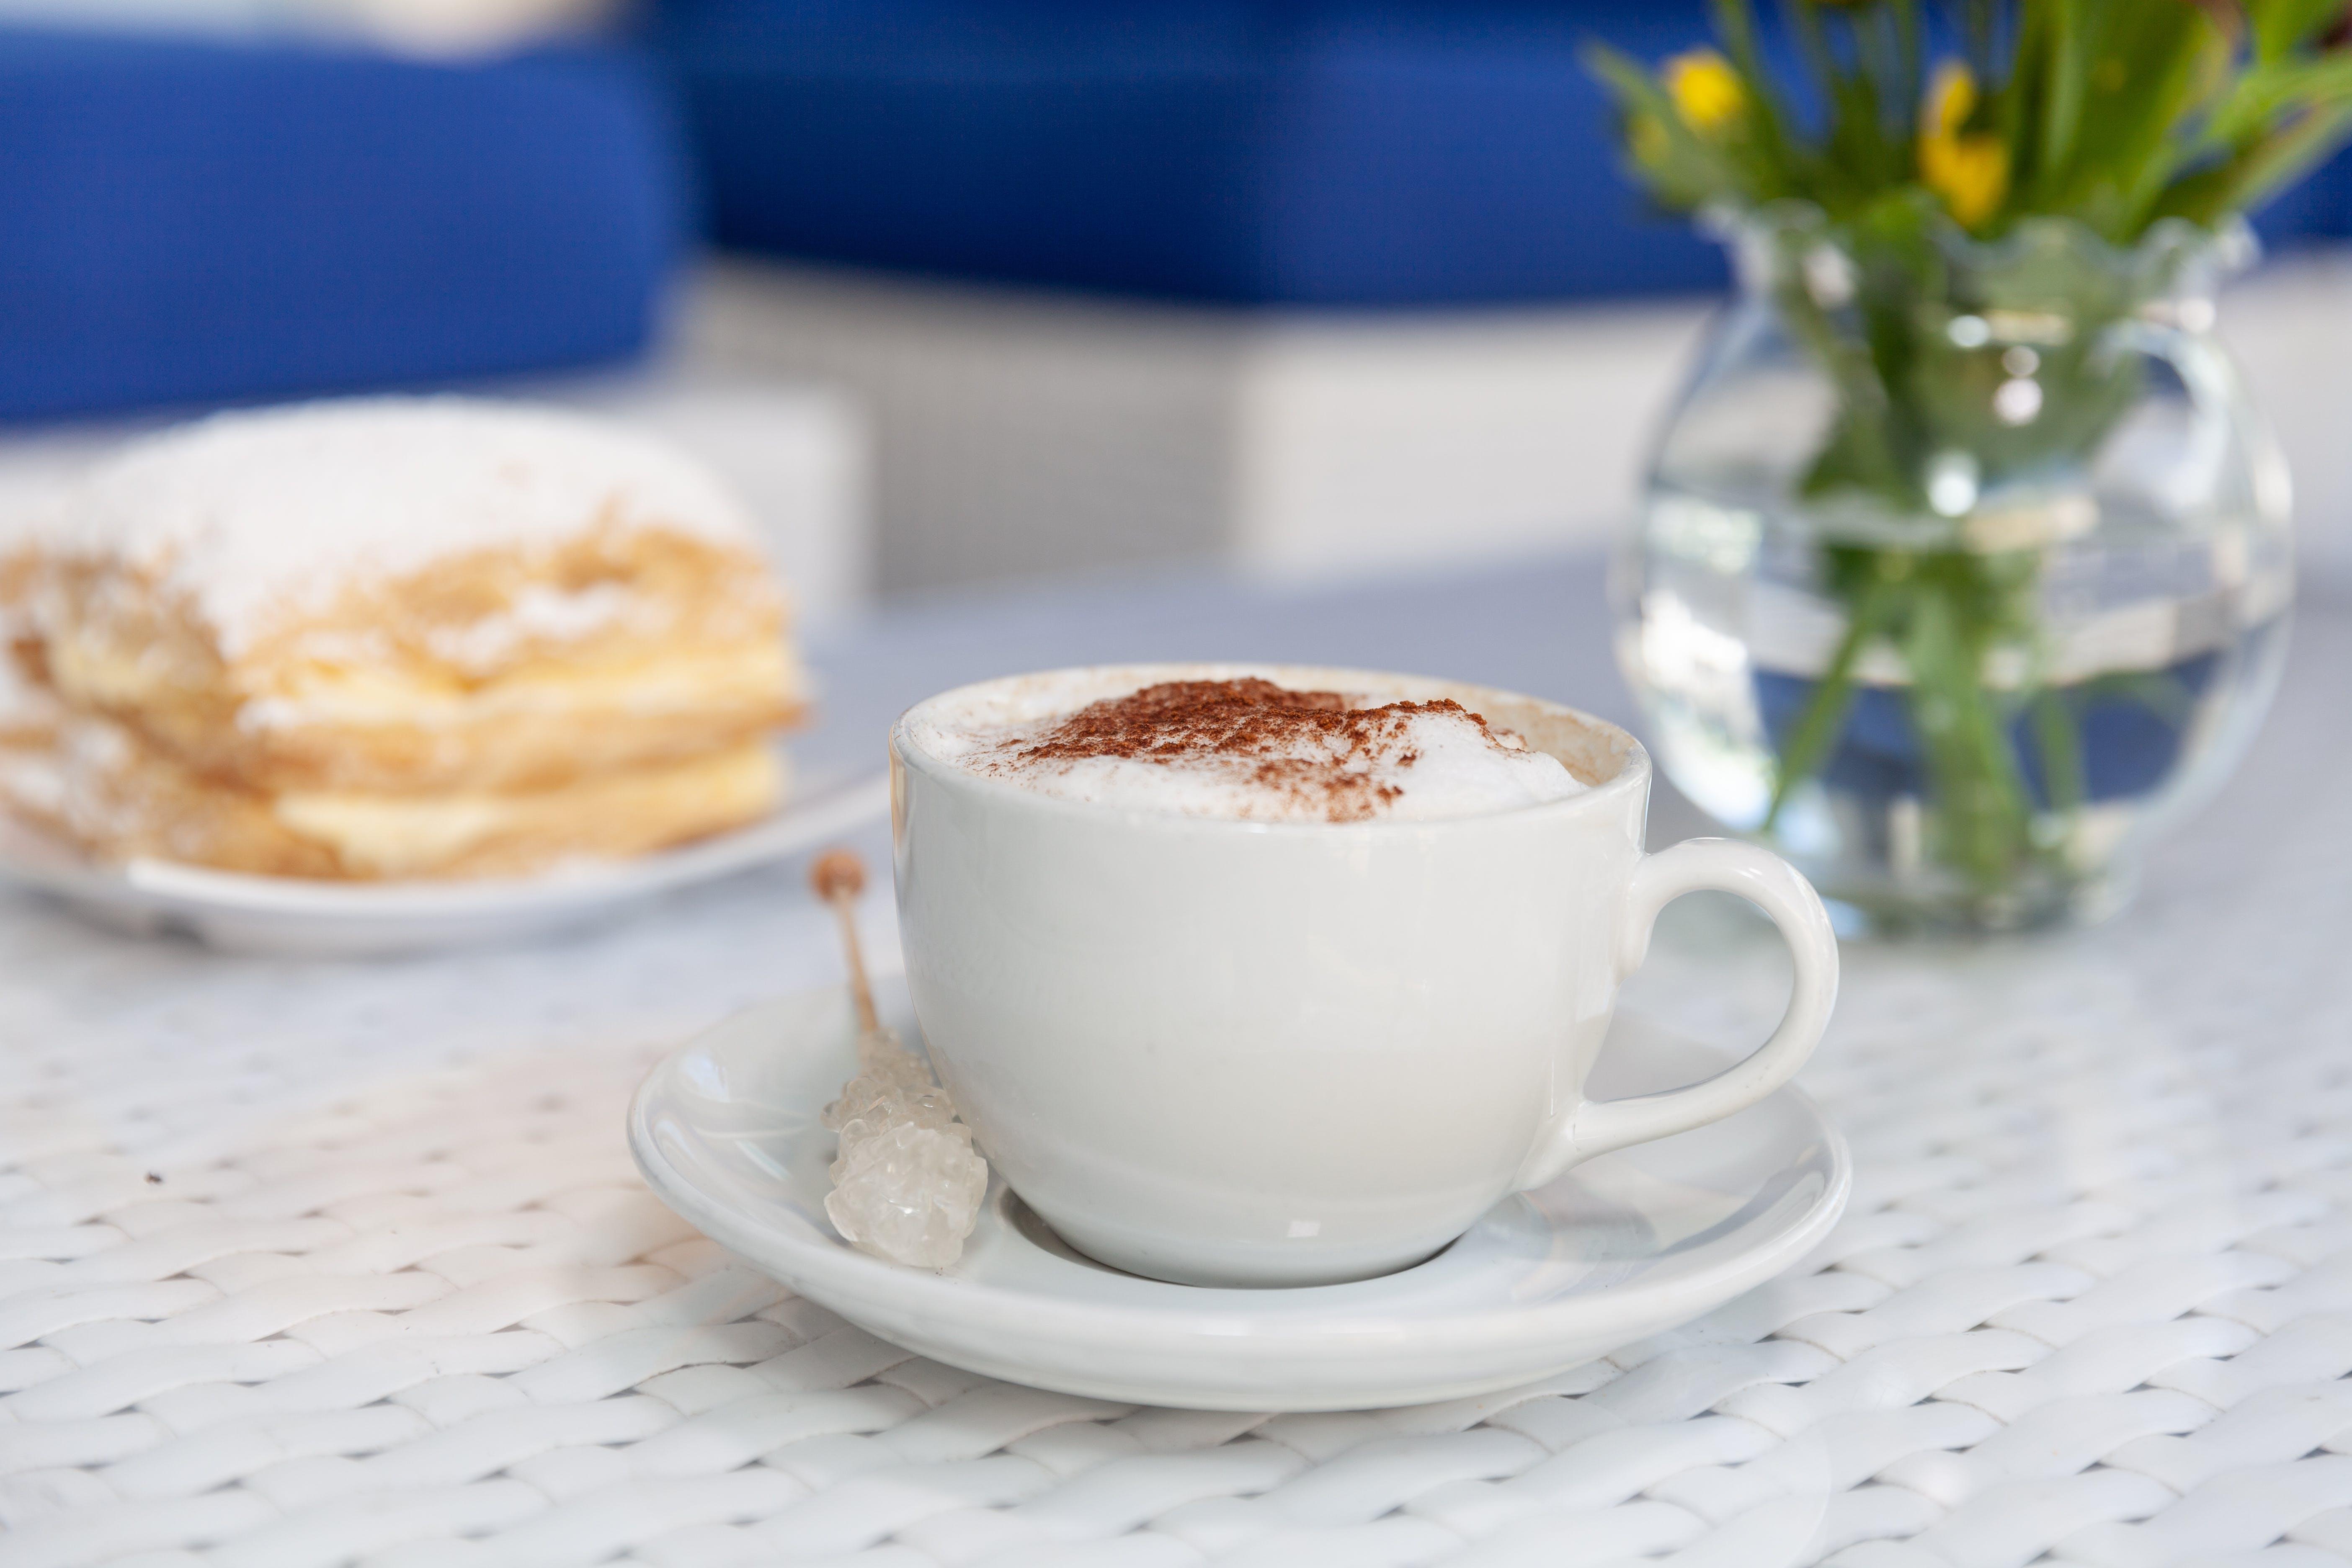 Kostenloses Stock Foto zu baklava, becher, cappuccino, espresso